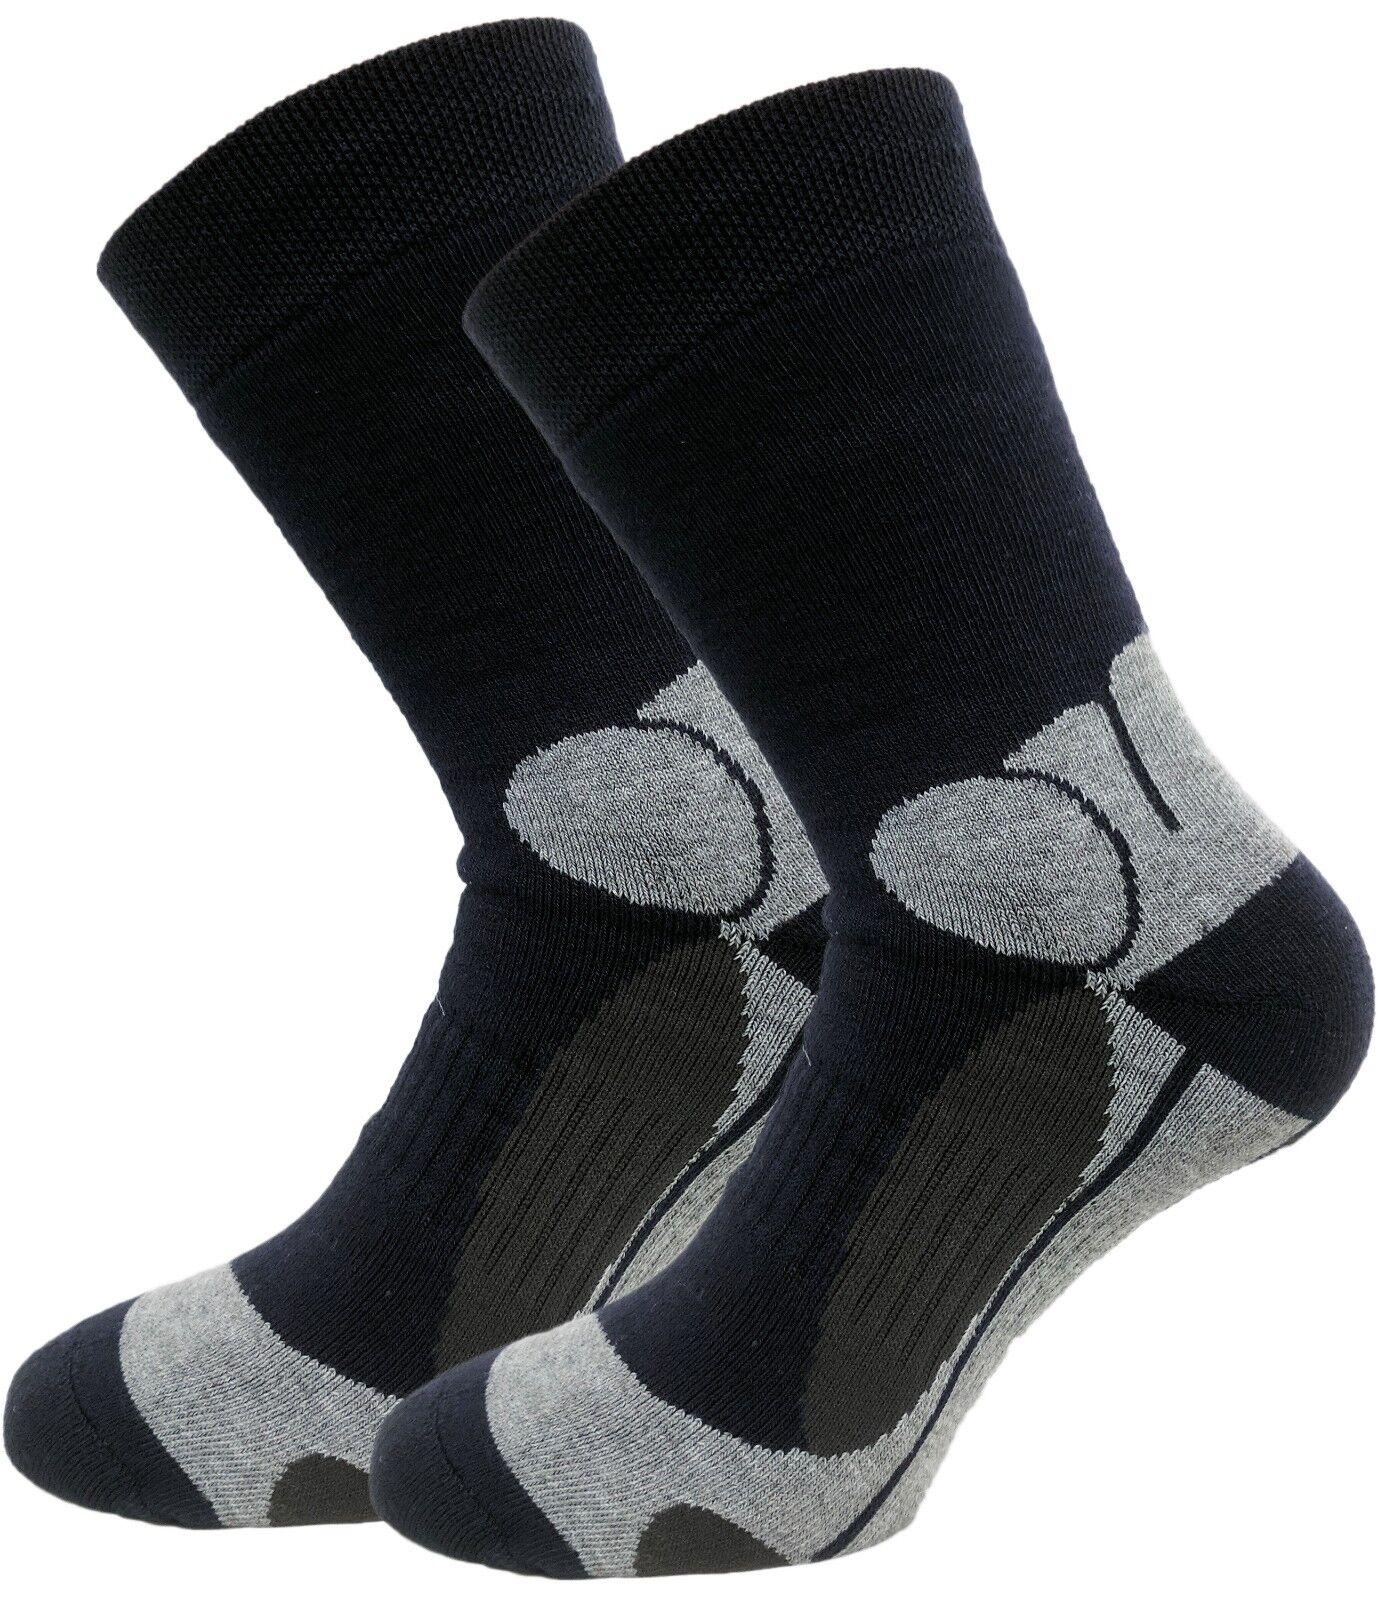 6x Thermo- Funktions-Socken - Wintersocken - Herren Ski- Sport Socken Frotteefuß